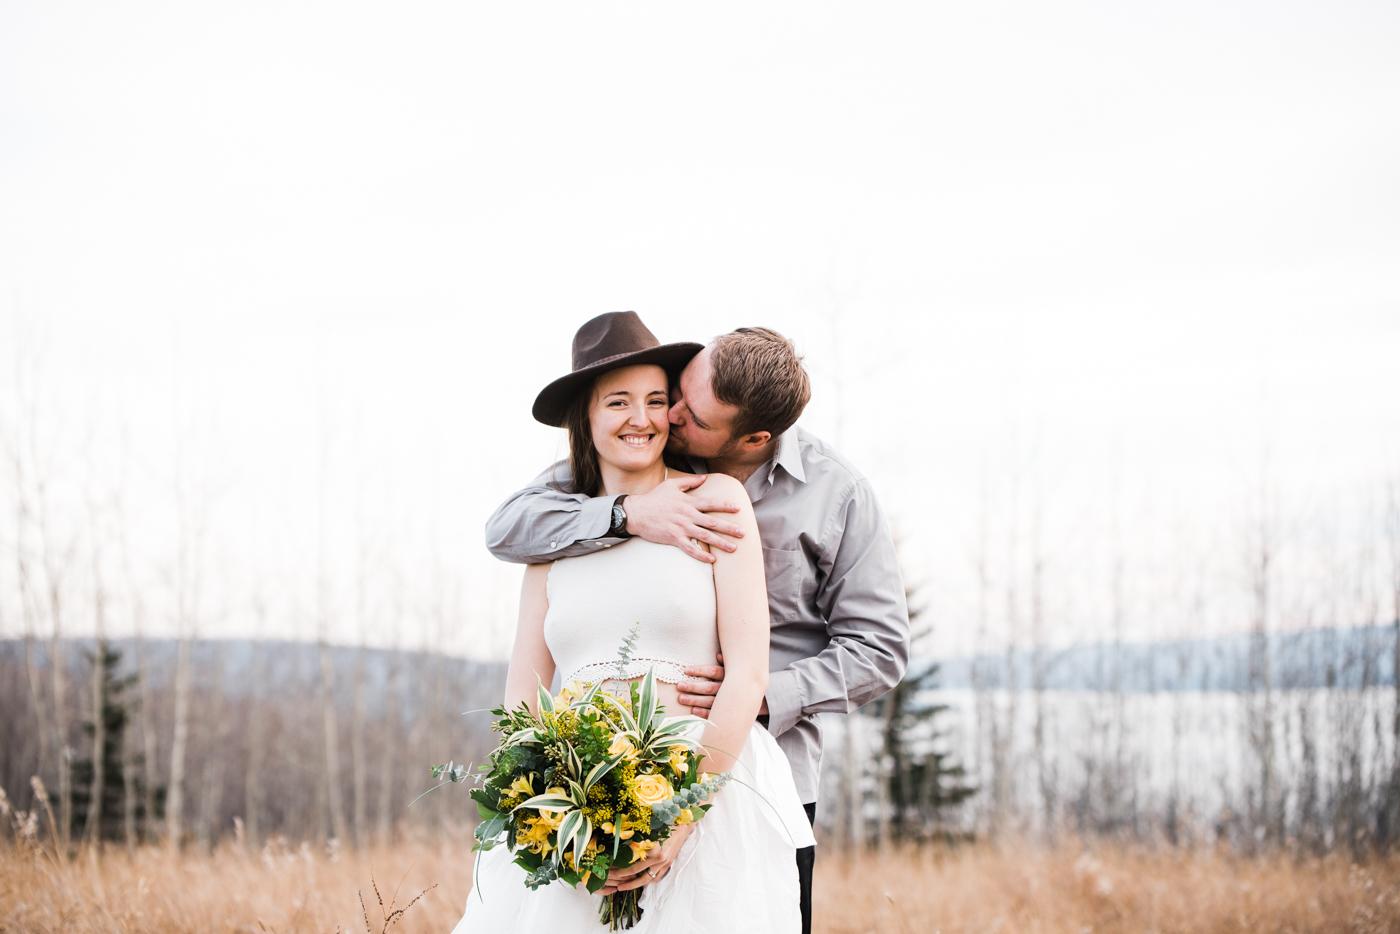 FortSt.John_photographer_TyraEPhotography_Wedding_Couple_Family_Photograhy_DawsonCreek_Elopement_Bride_Boduoir_Portraits-32.jpg